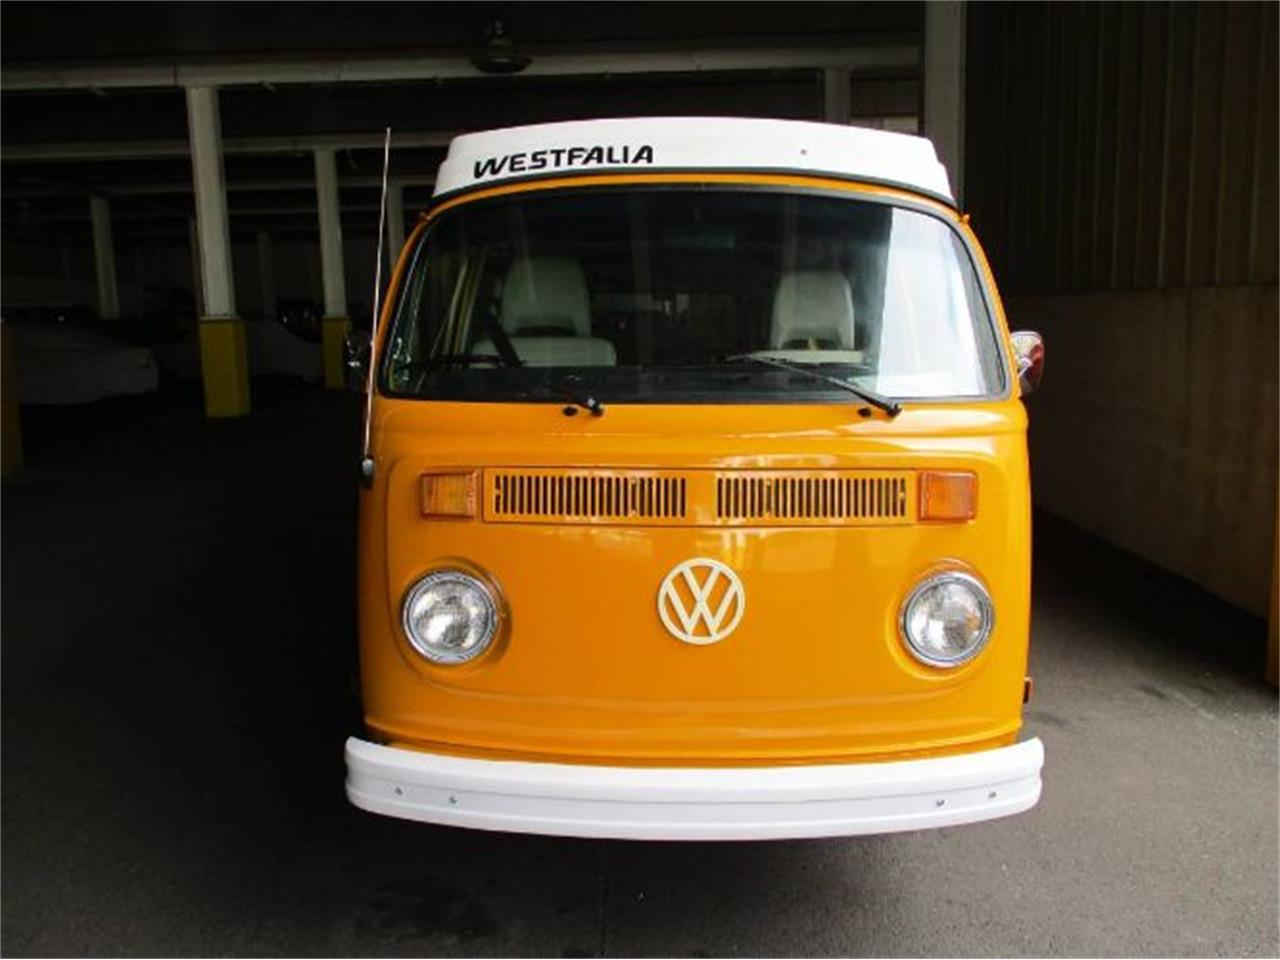 Large Picture of 1976 Volkswagen Westfalia Camper located in Michigan - $35,495.00 - Q56J